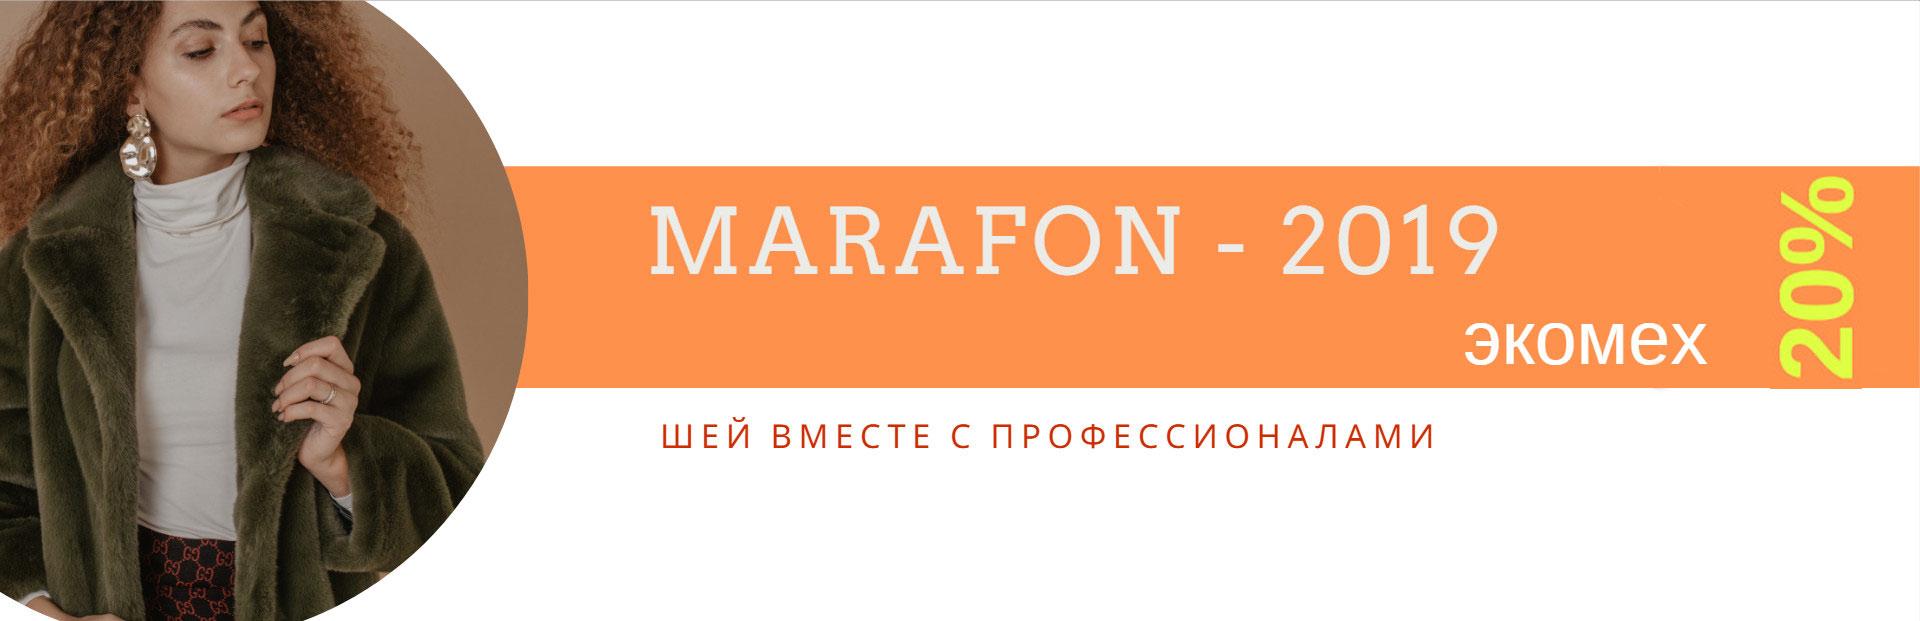 марафон по экомеху